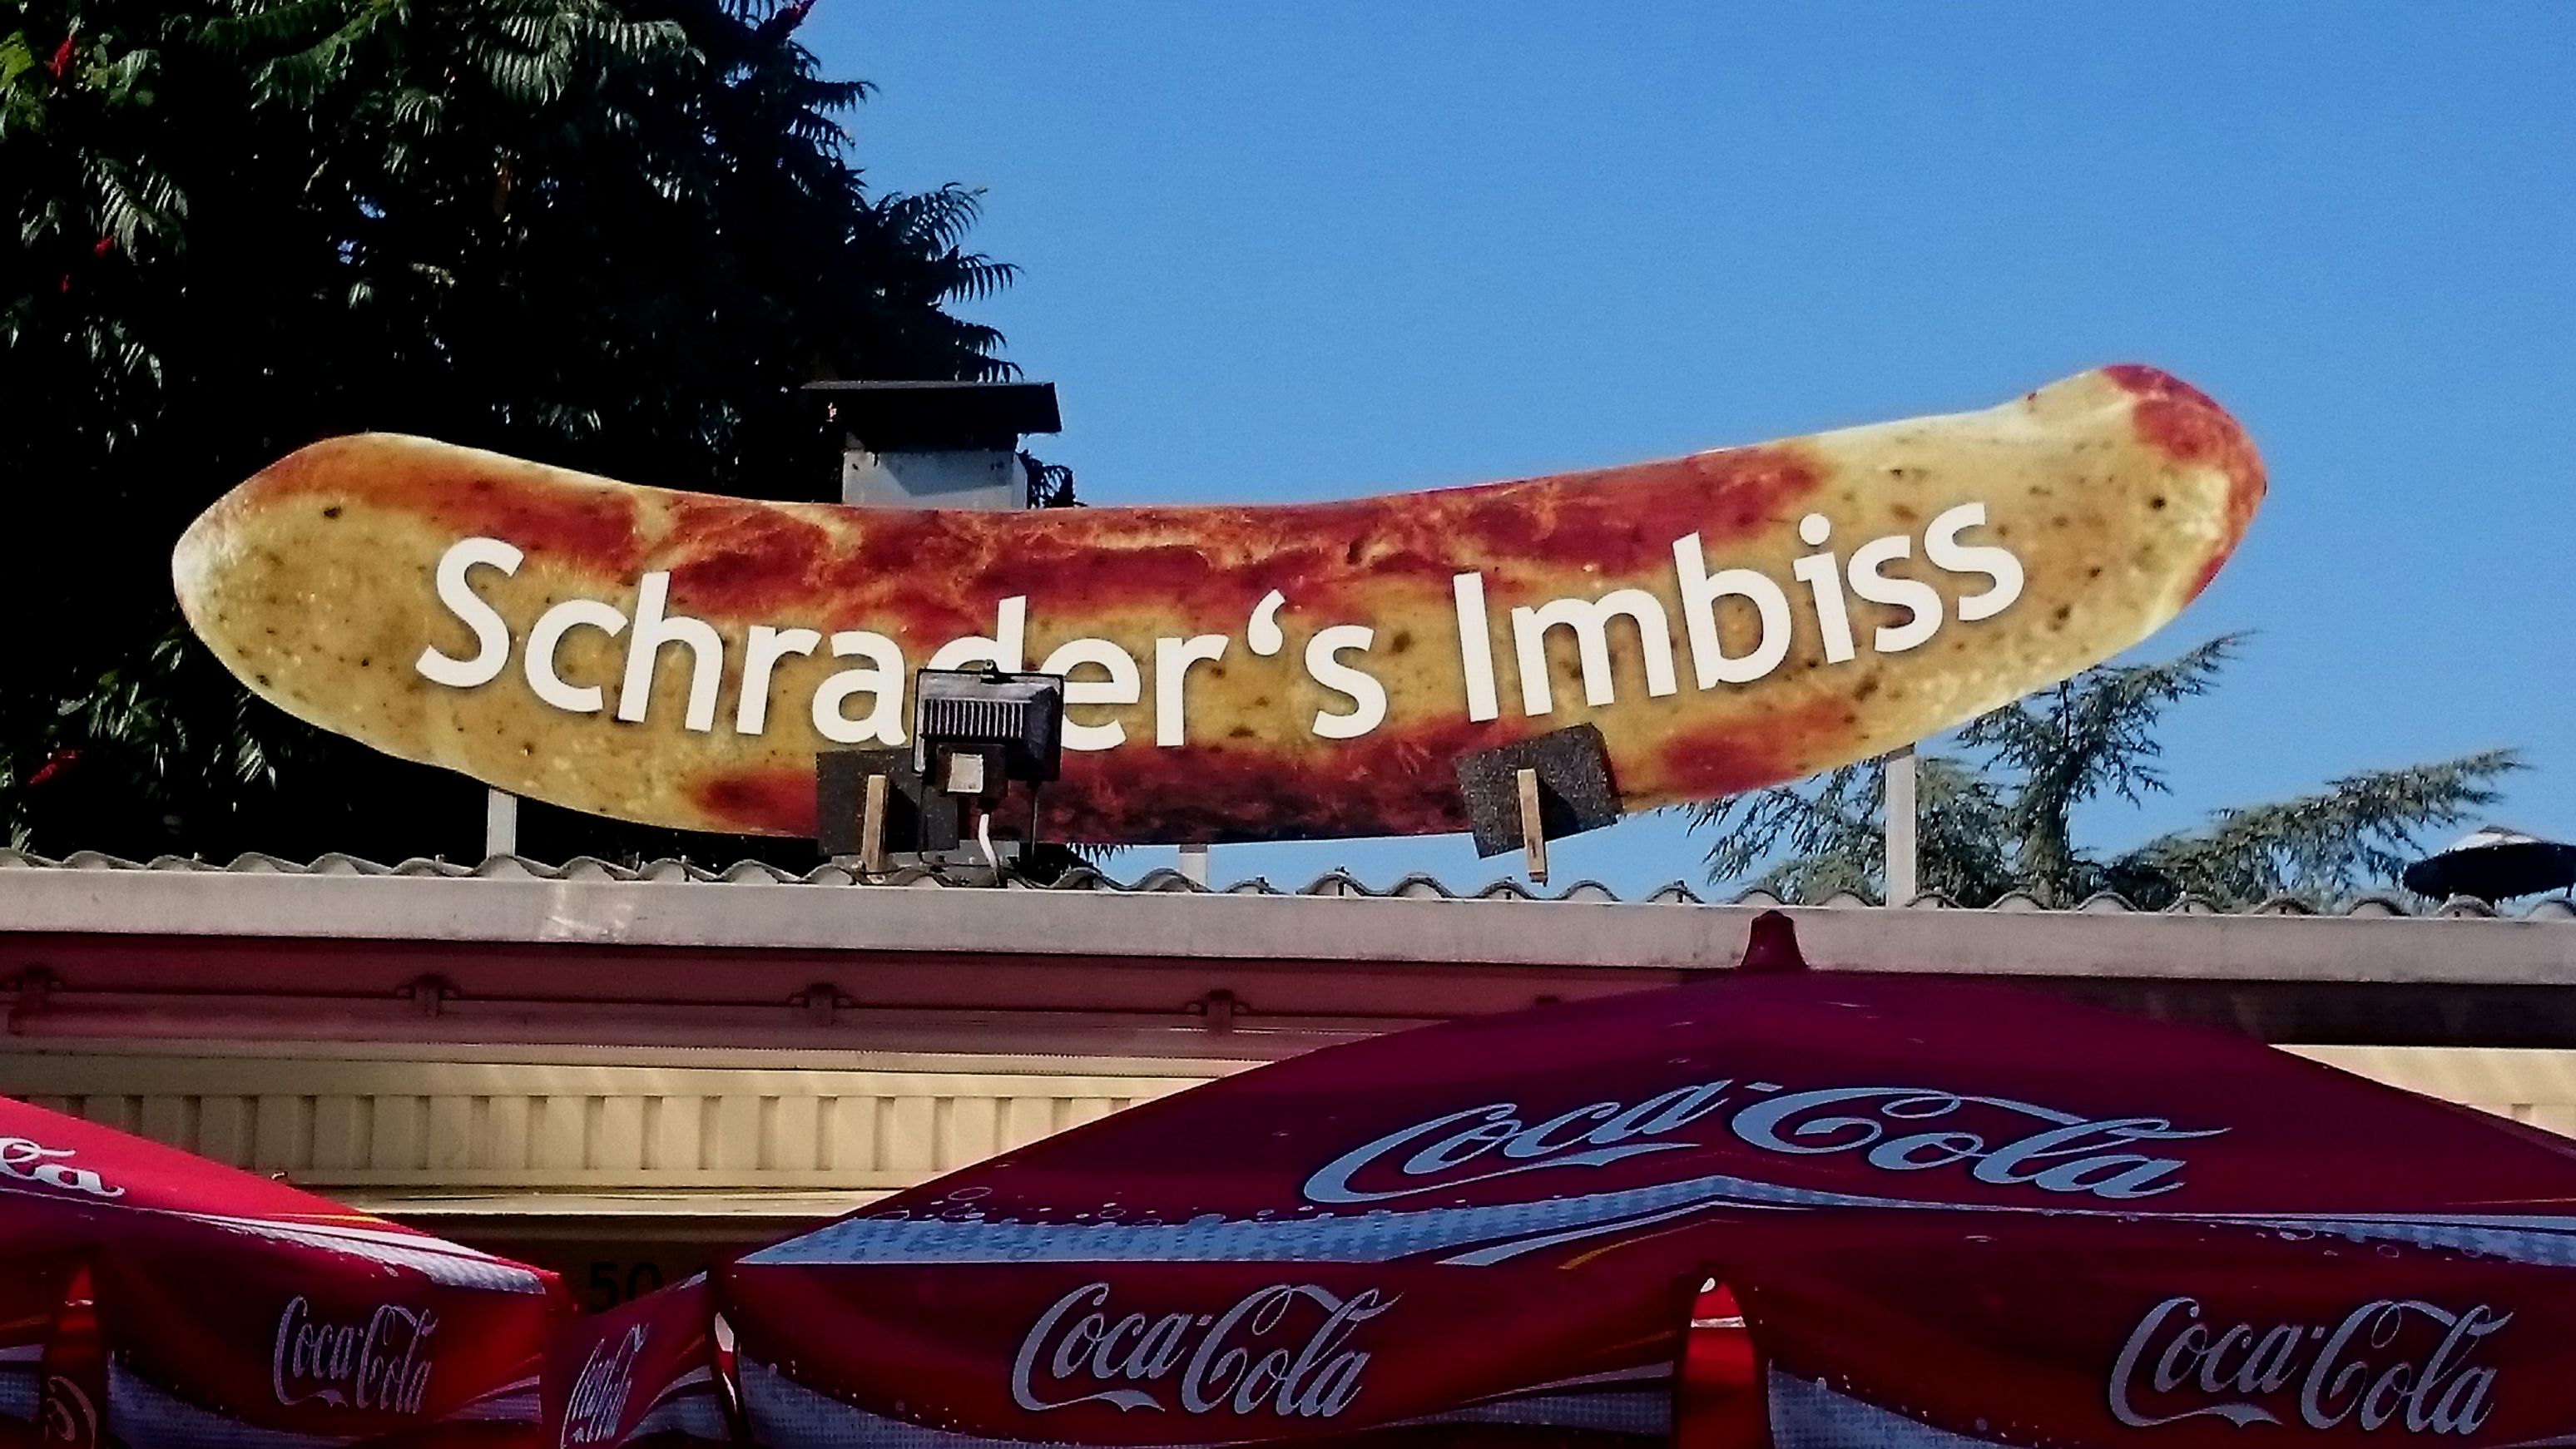 Schraders Imbiss